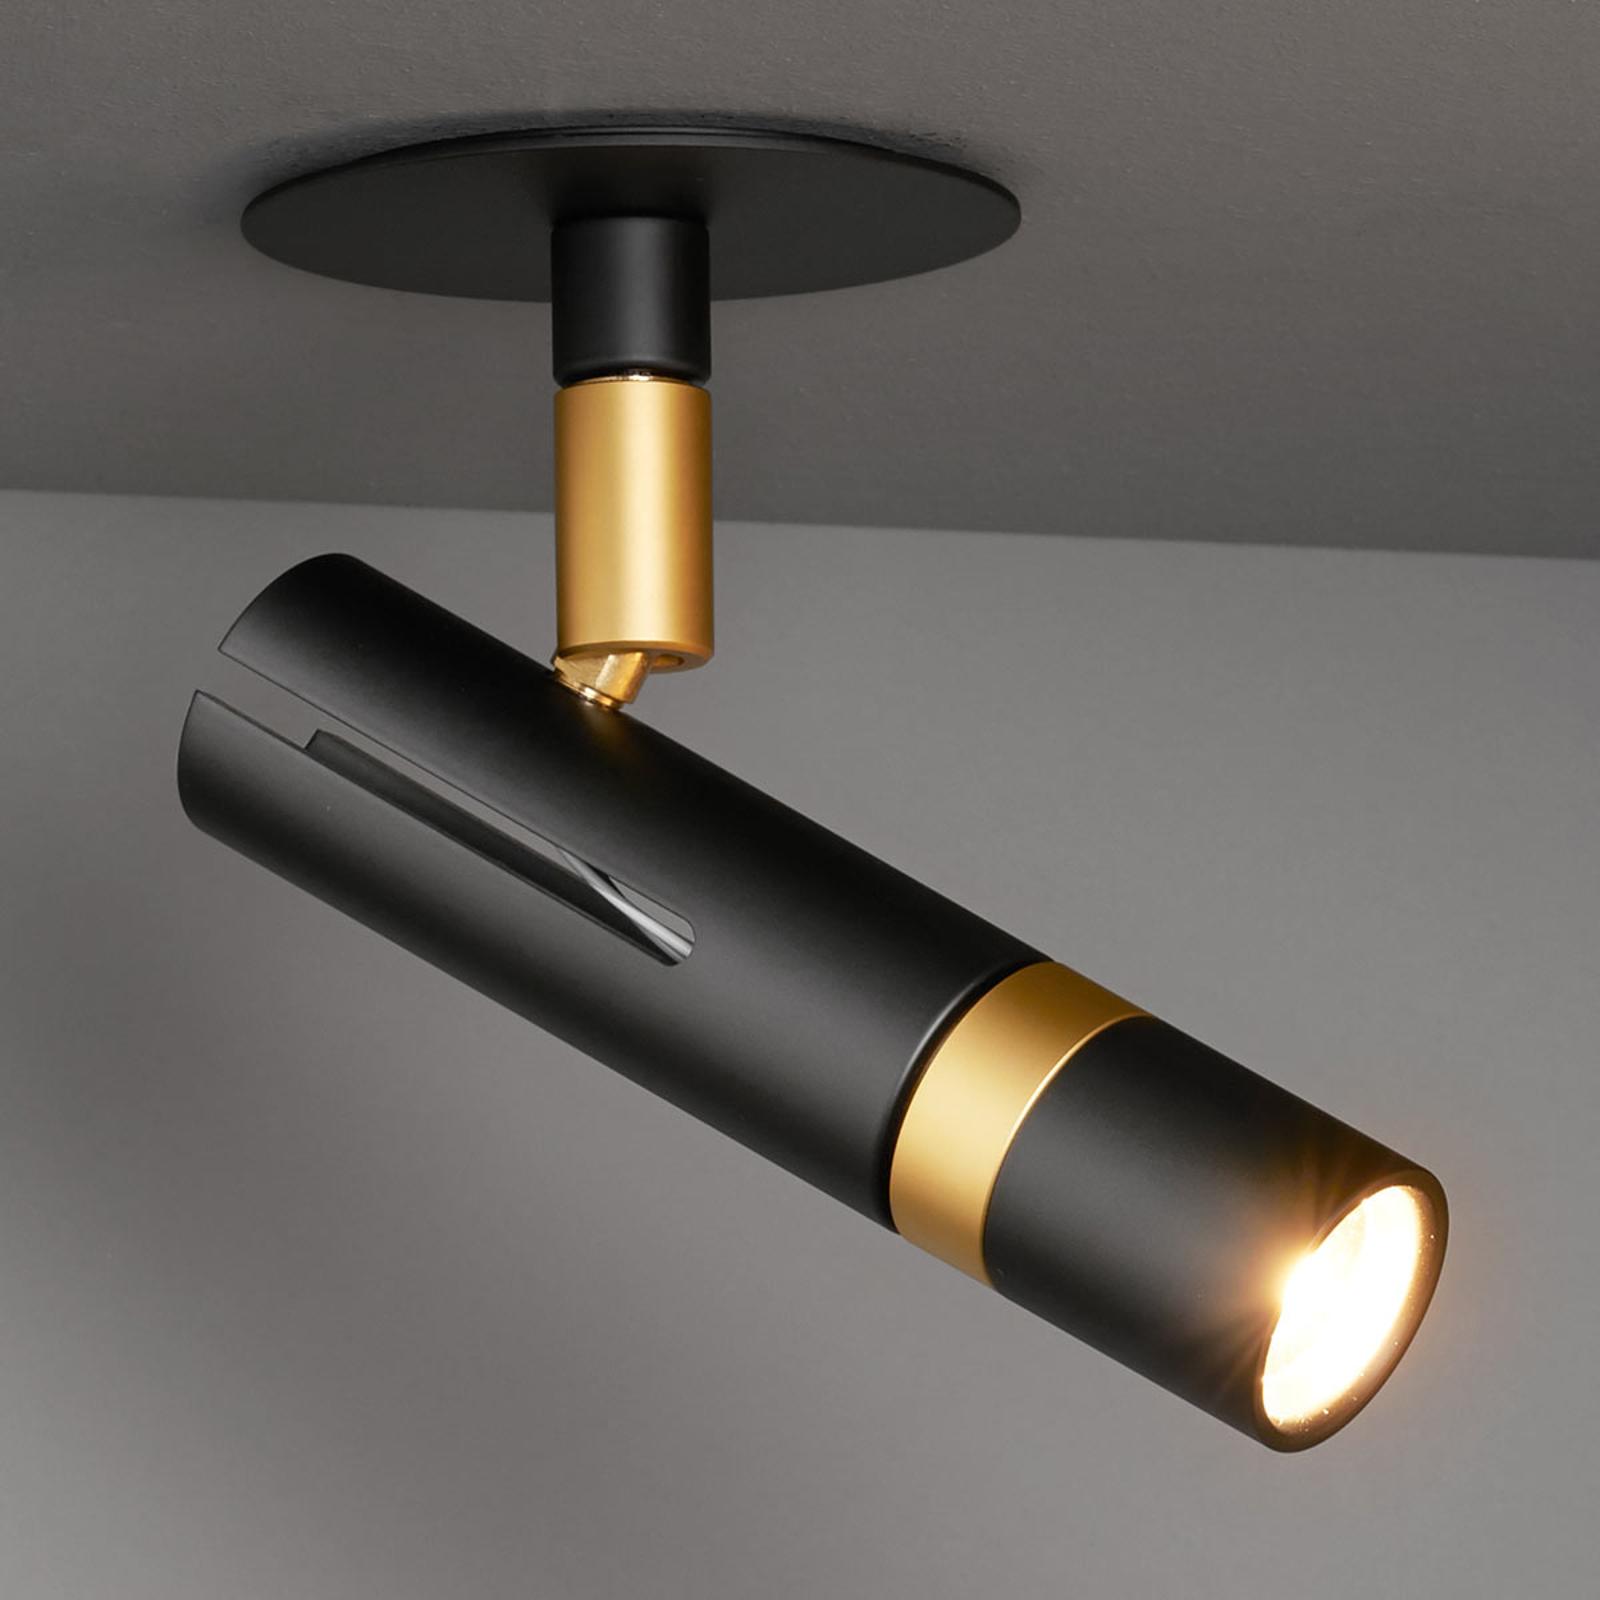 LDM Kyno LED-spot loftsbeslag indbygning sort/guld